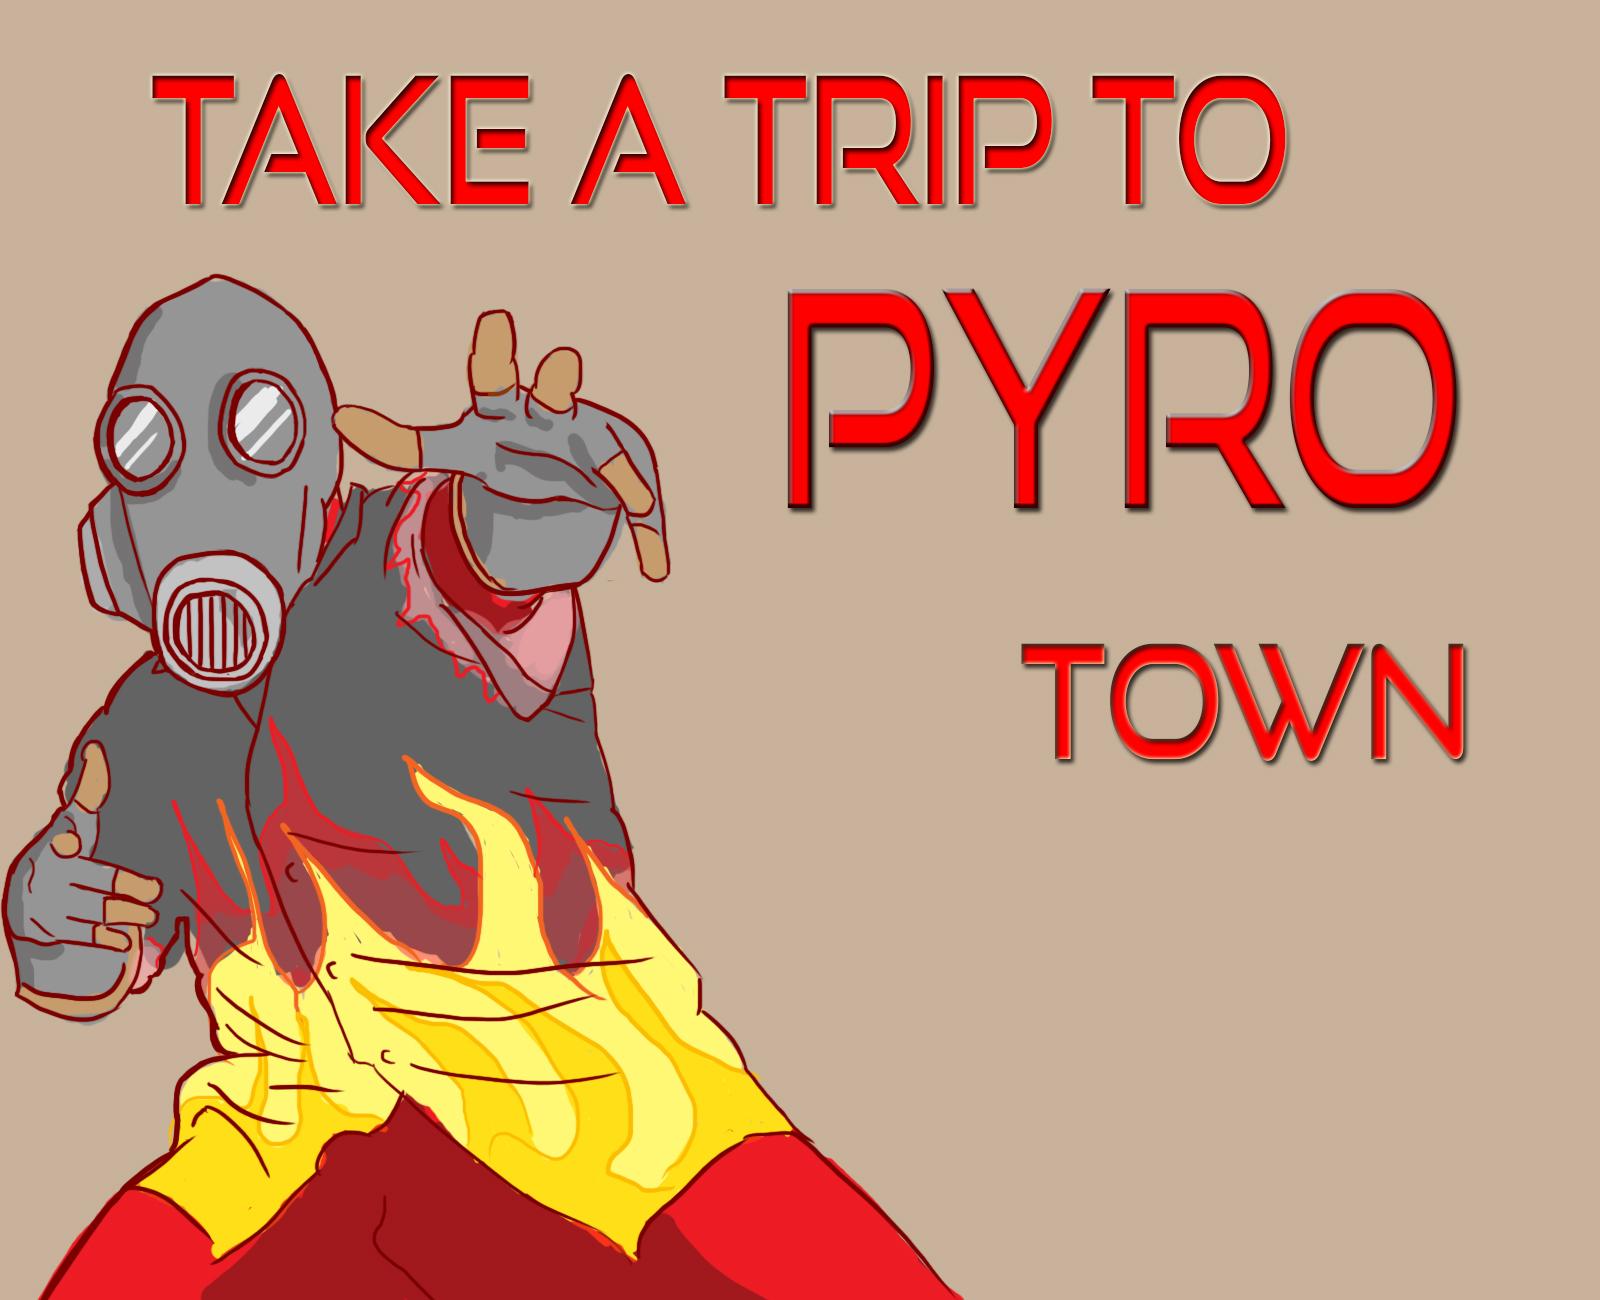 Pyro town